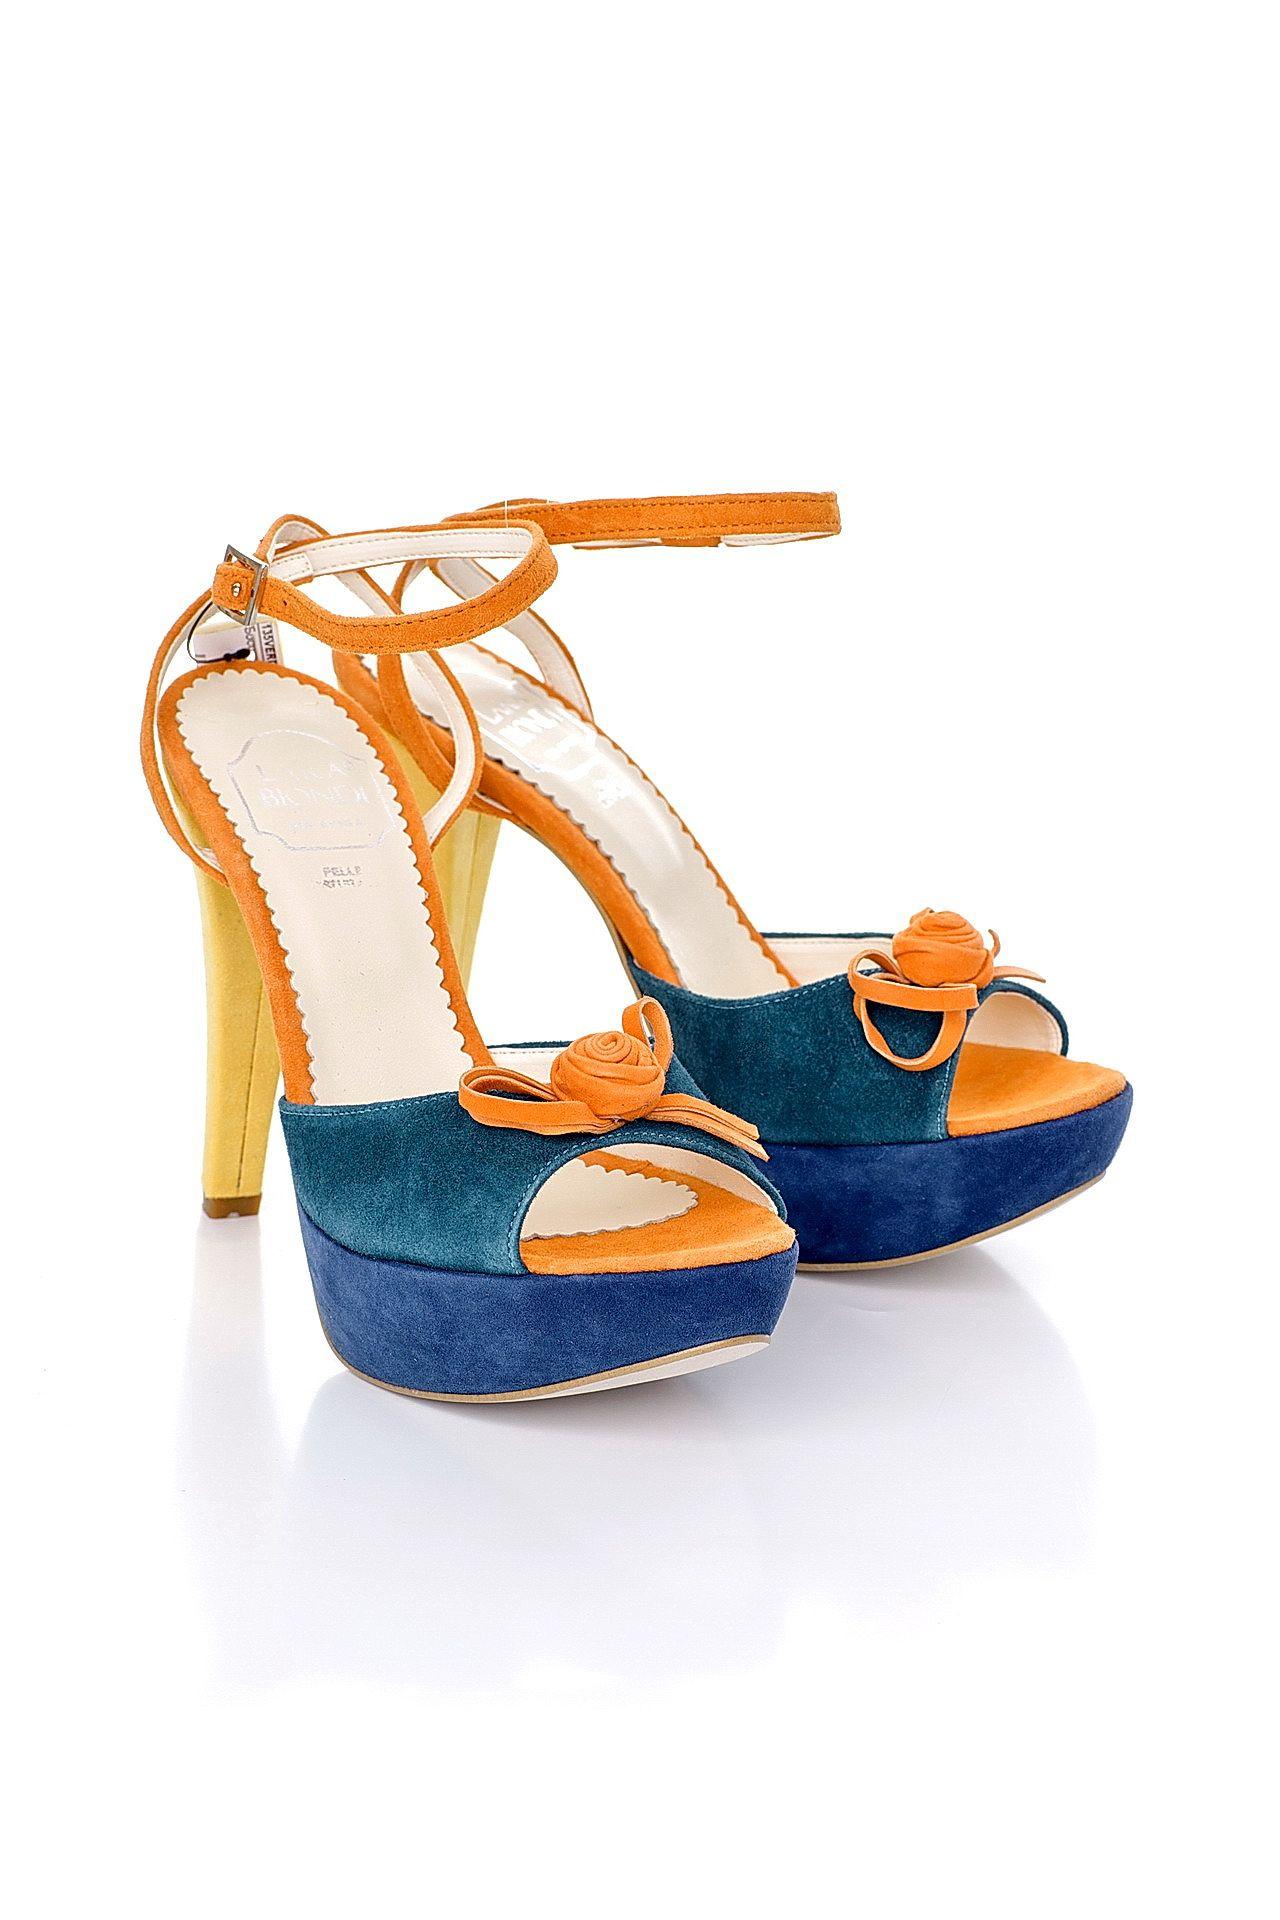 Босоножки LARA BIONDI темно синие замшевые туфли мужские